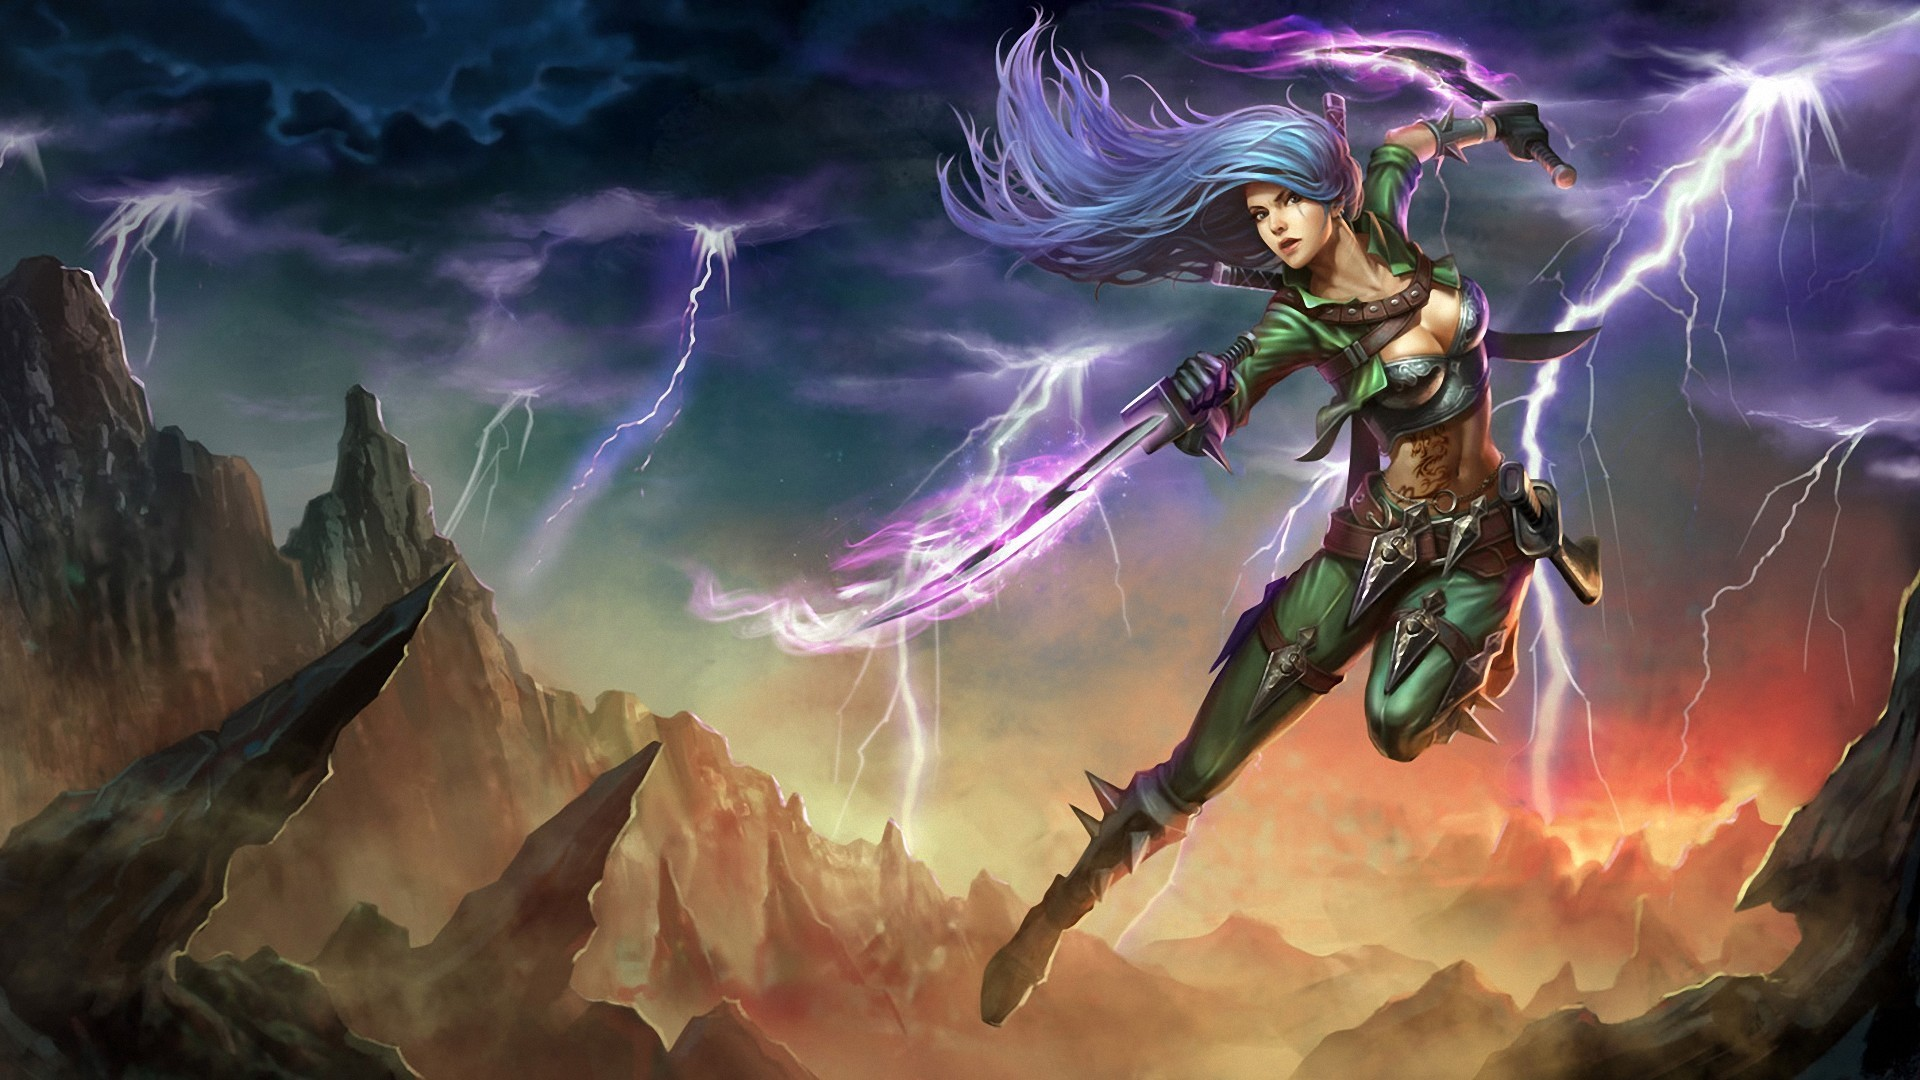 Free Download League Of Legends Katarina Hd Wallpaper 1920x1080